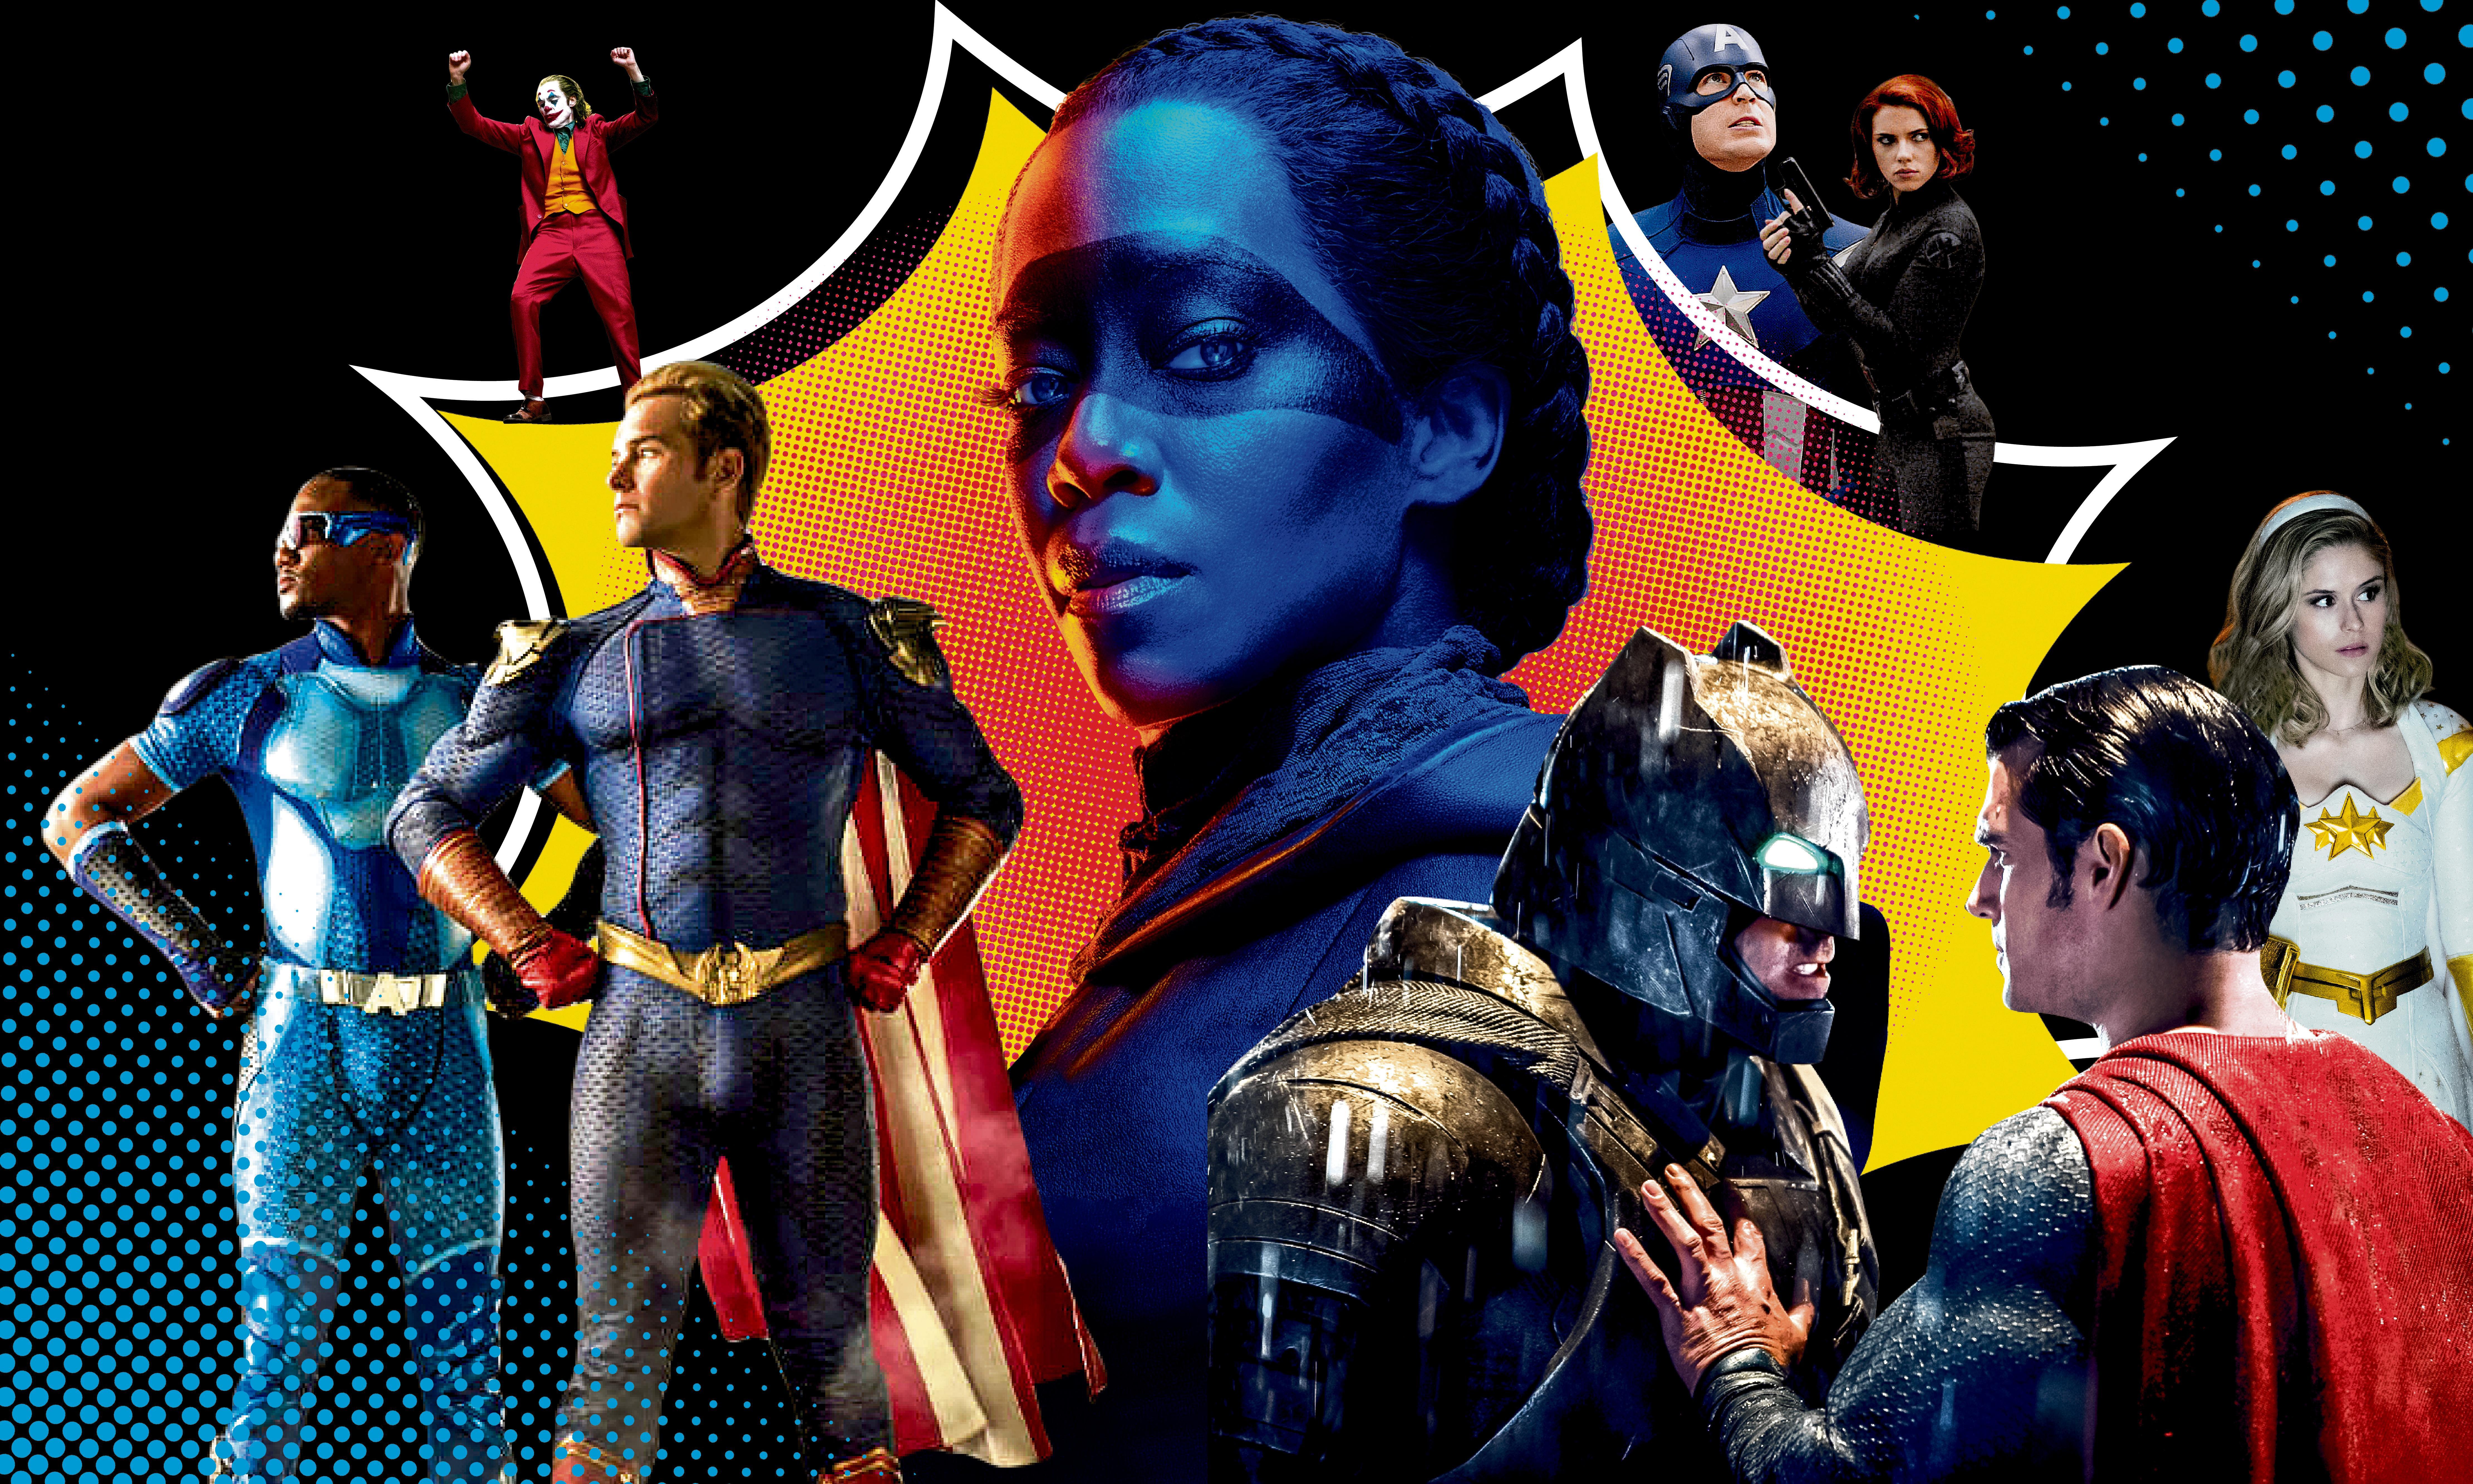 Auteurs assemble! What caused the superhero backlash?